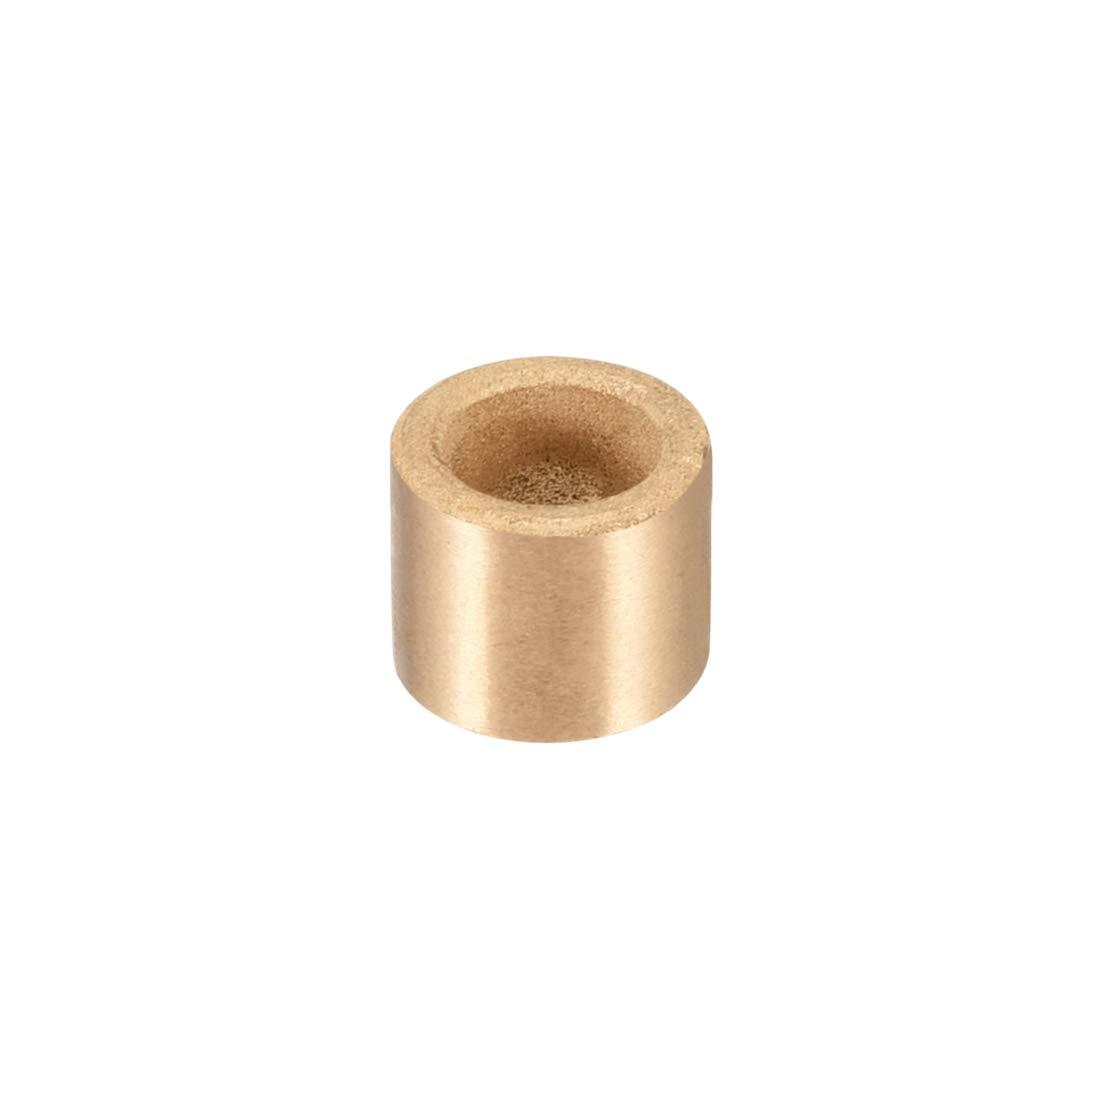 uxcell Bearing Sleeve 8mm Bore x 12mm OD x 10mm Length Self-Lubricating Sintered Bronze Bushings